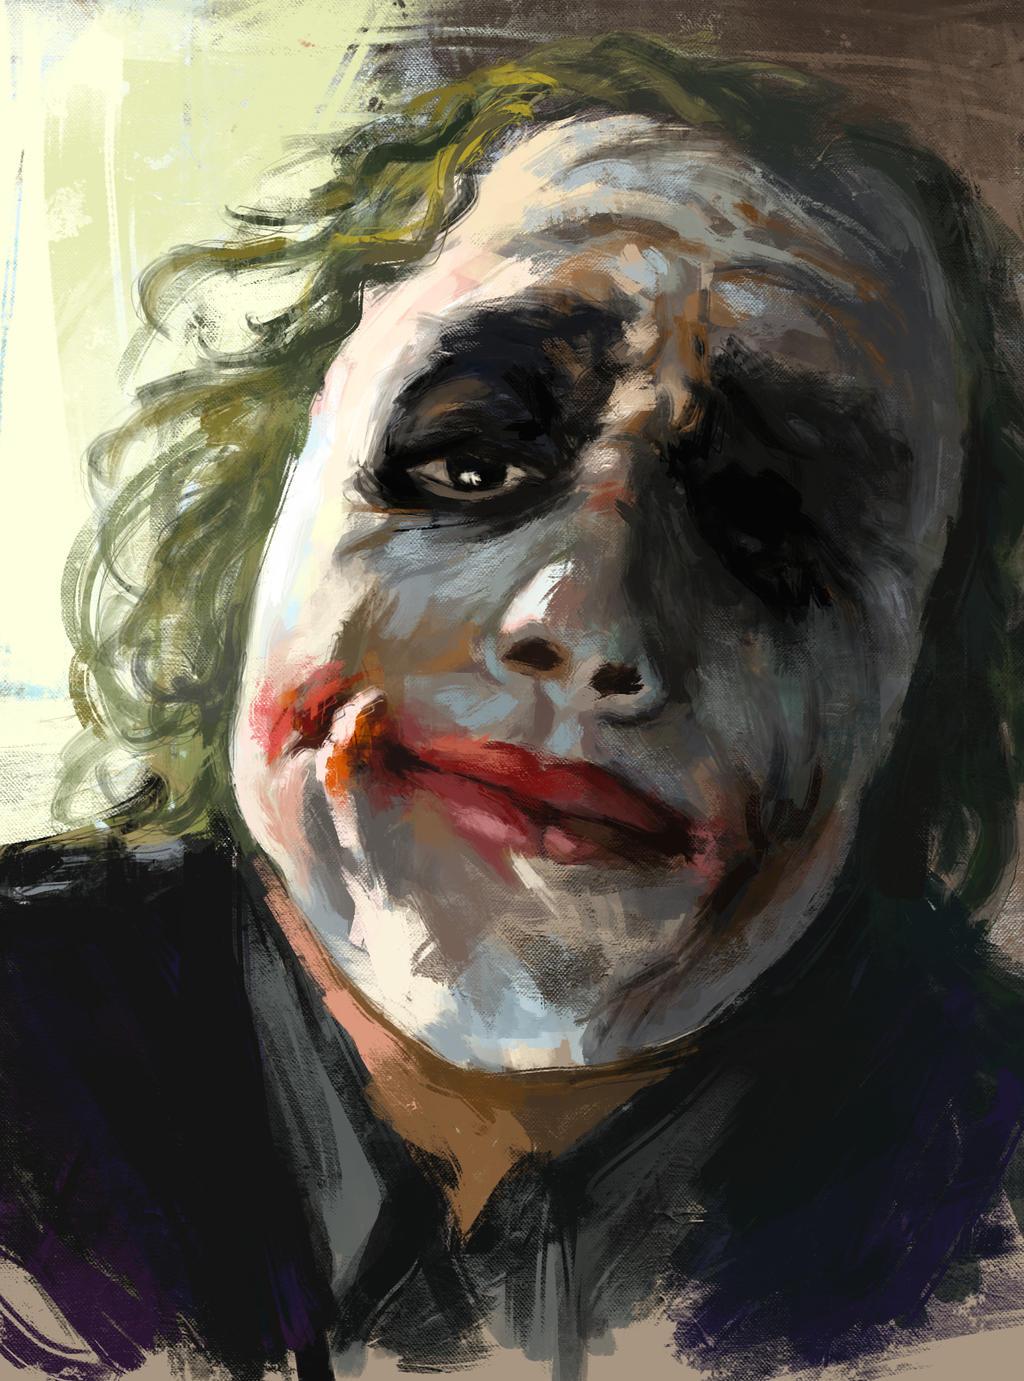 The Sad Clown by RedPandaDee on DeviantArt